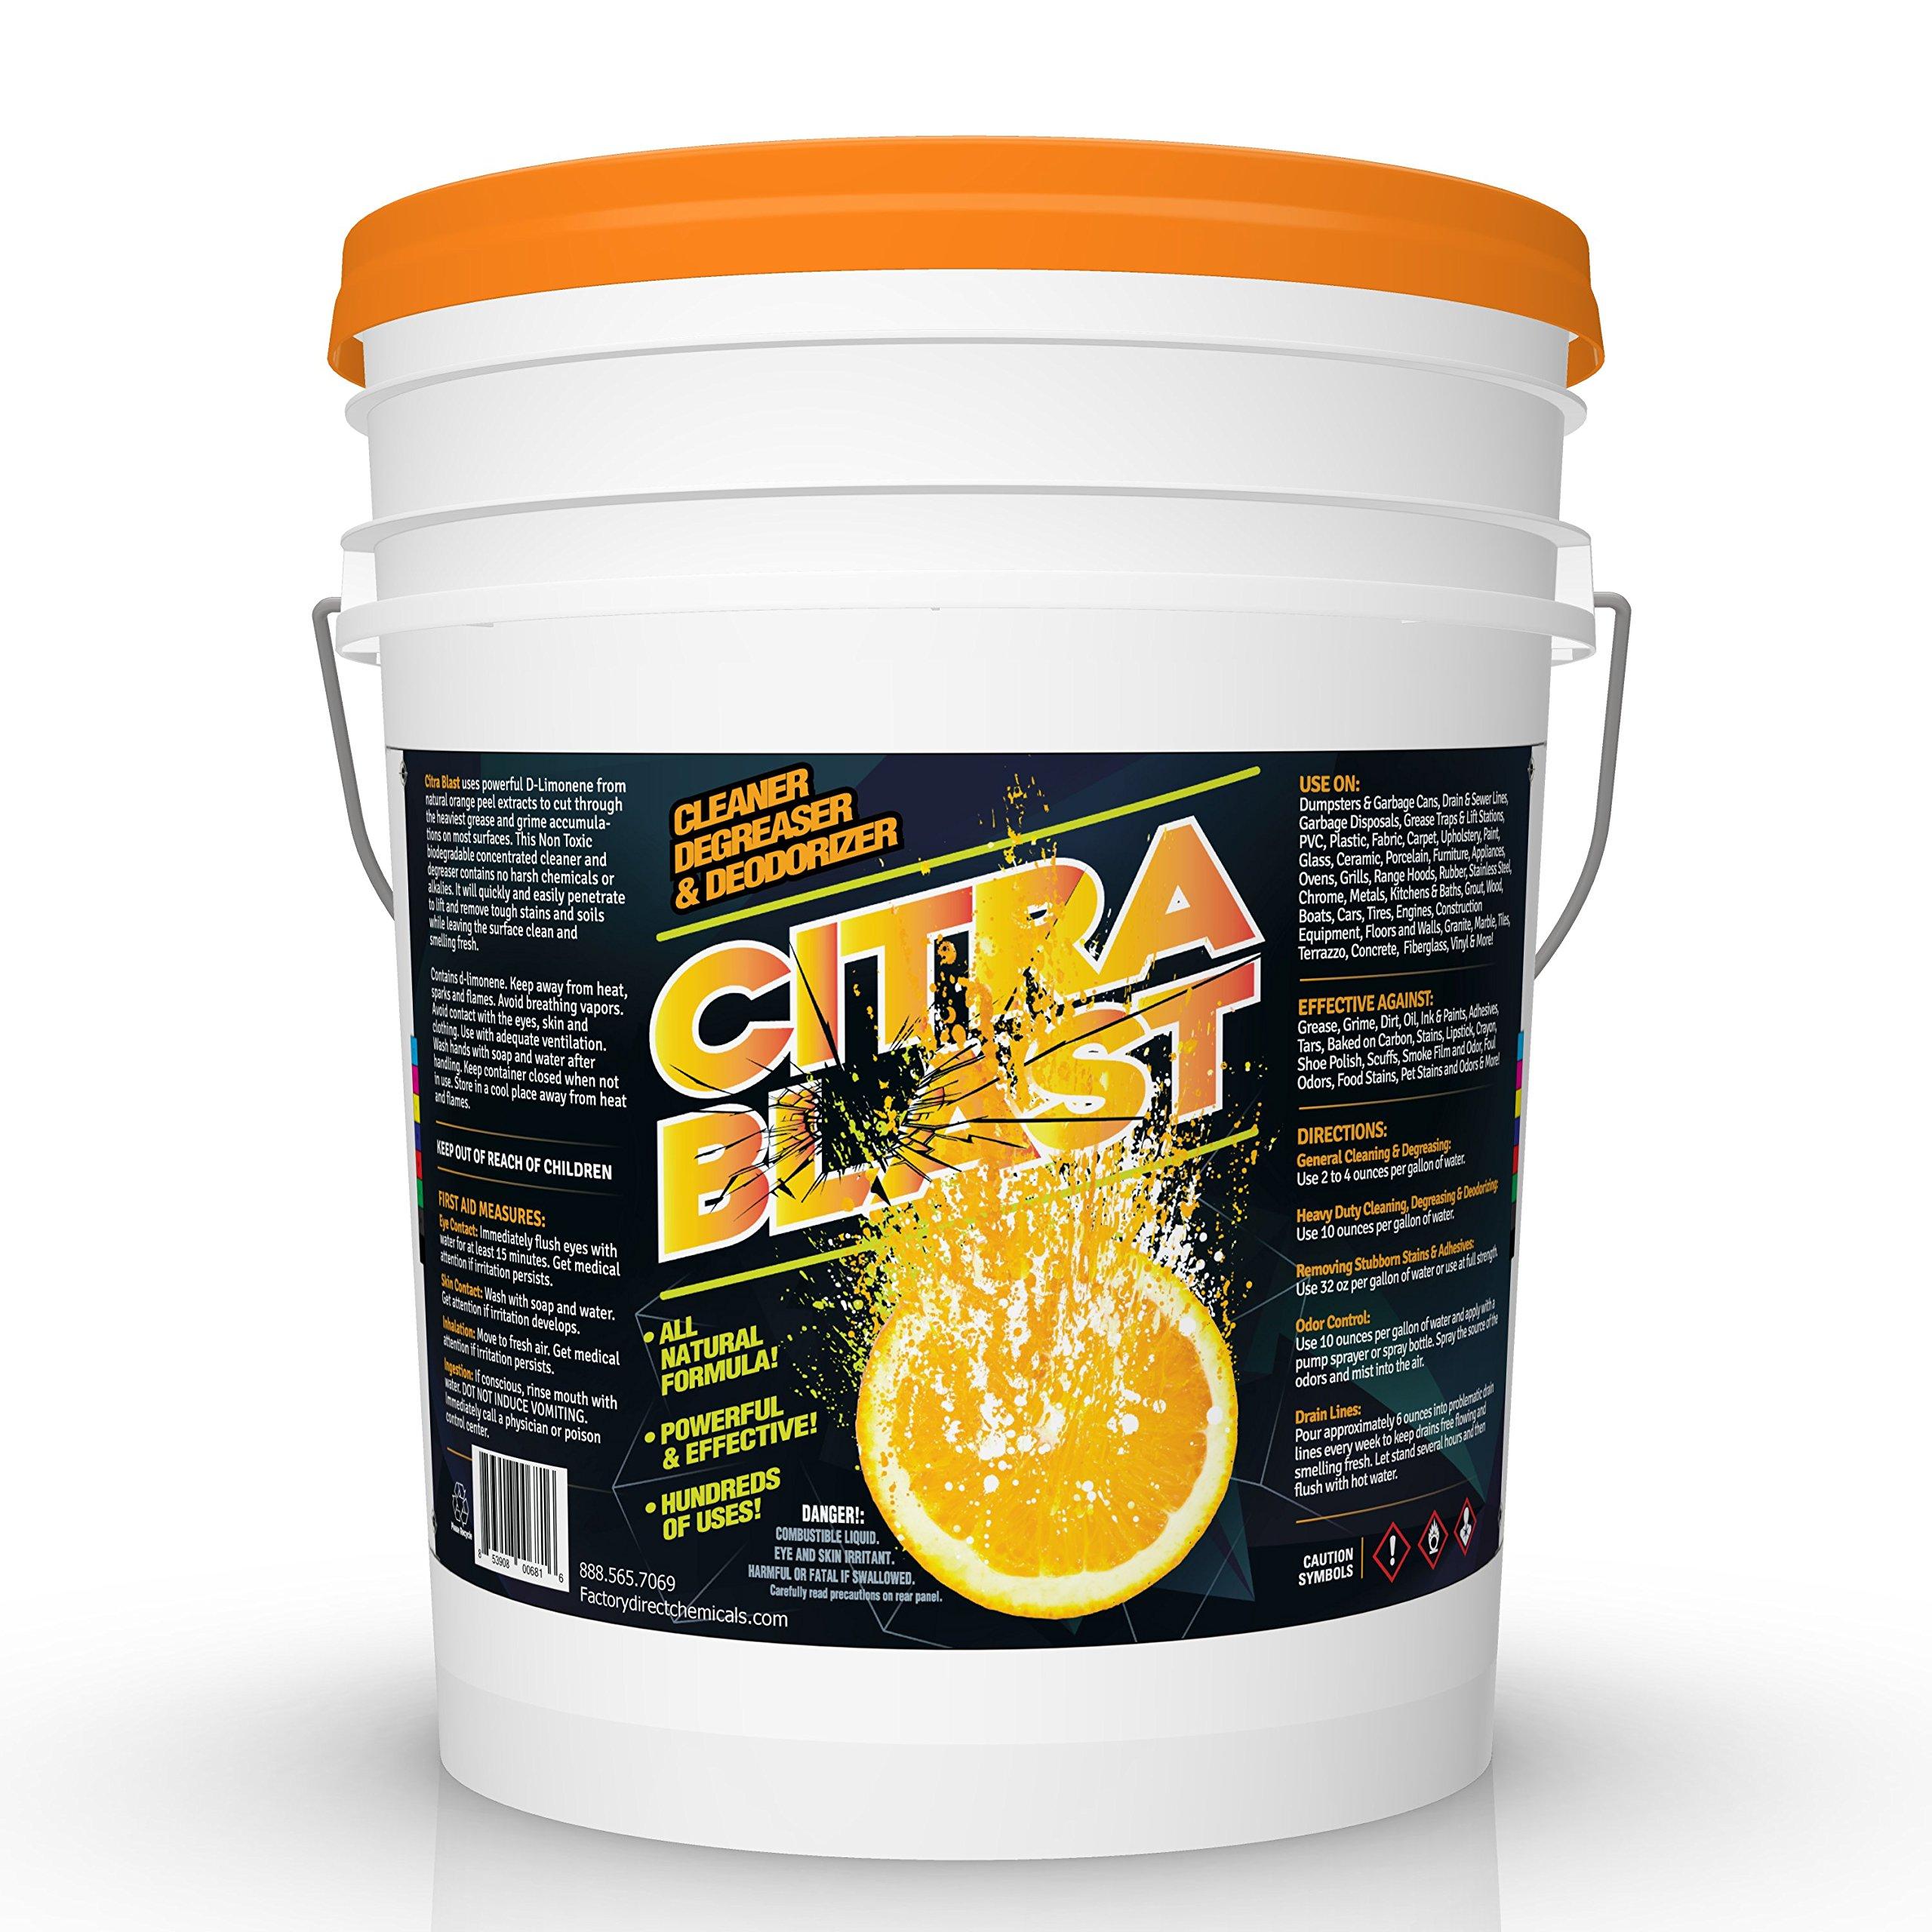 All Natural Orange Citrus D-Limonene Cleaner Degreaser & Deodorizer (5, Gallon) by FDC (Image #1)